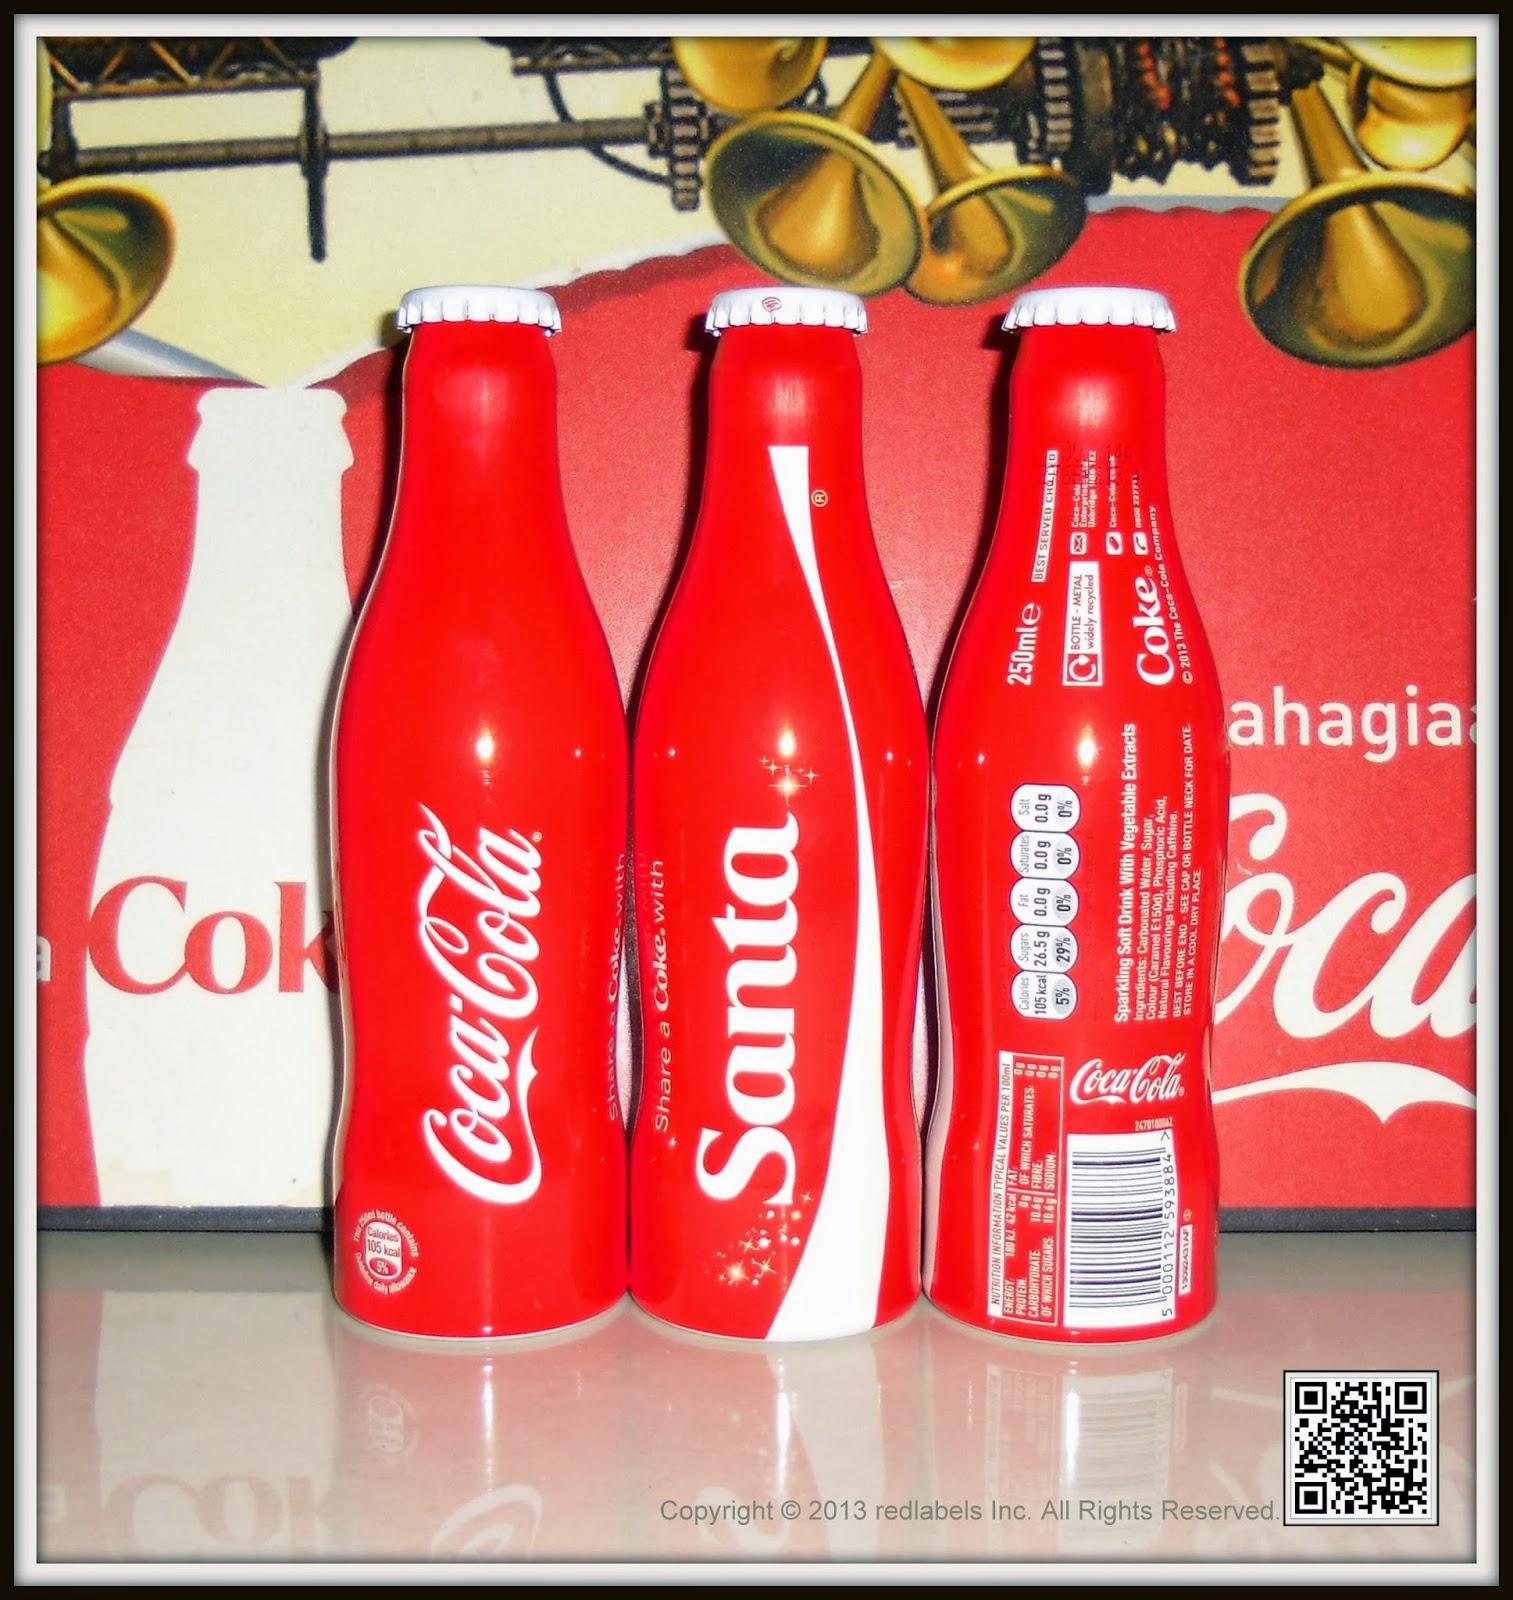 Aluminum Bottle Collector Club: Share a Coke with Santa Christmas Aluminum Bottle 2013 UK